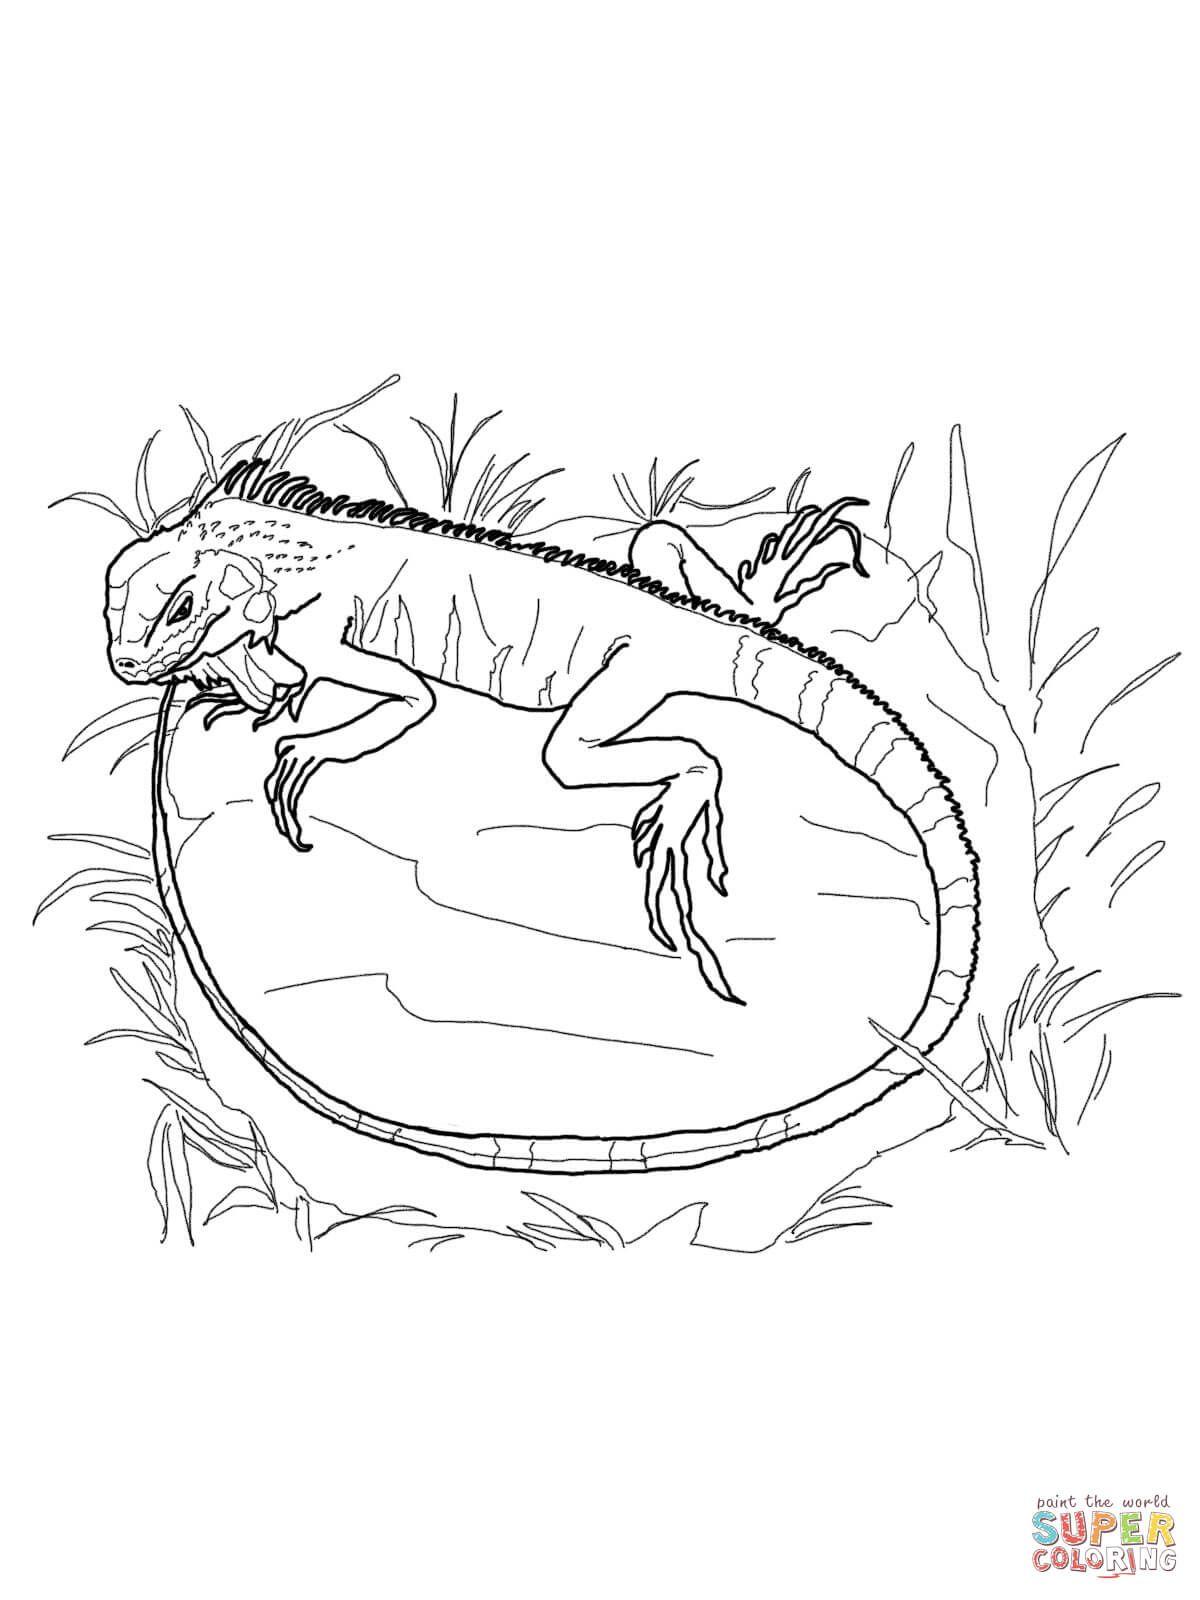 Galapagos Marine Iguana Coloring Page